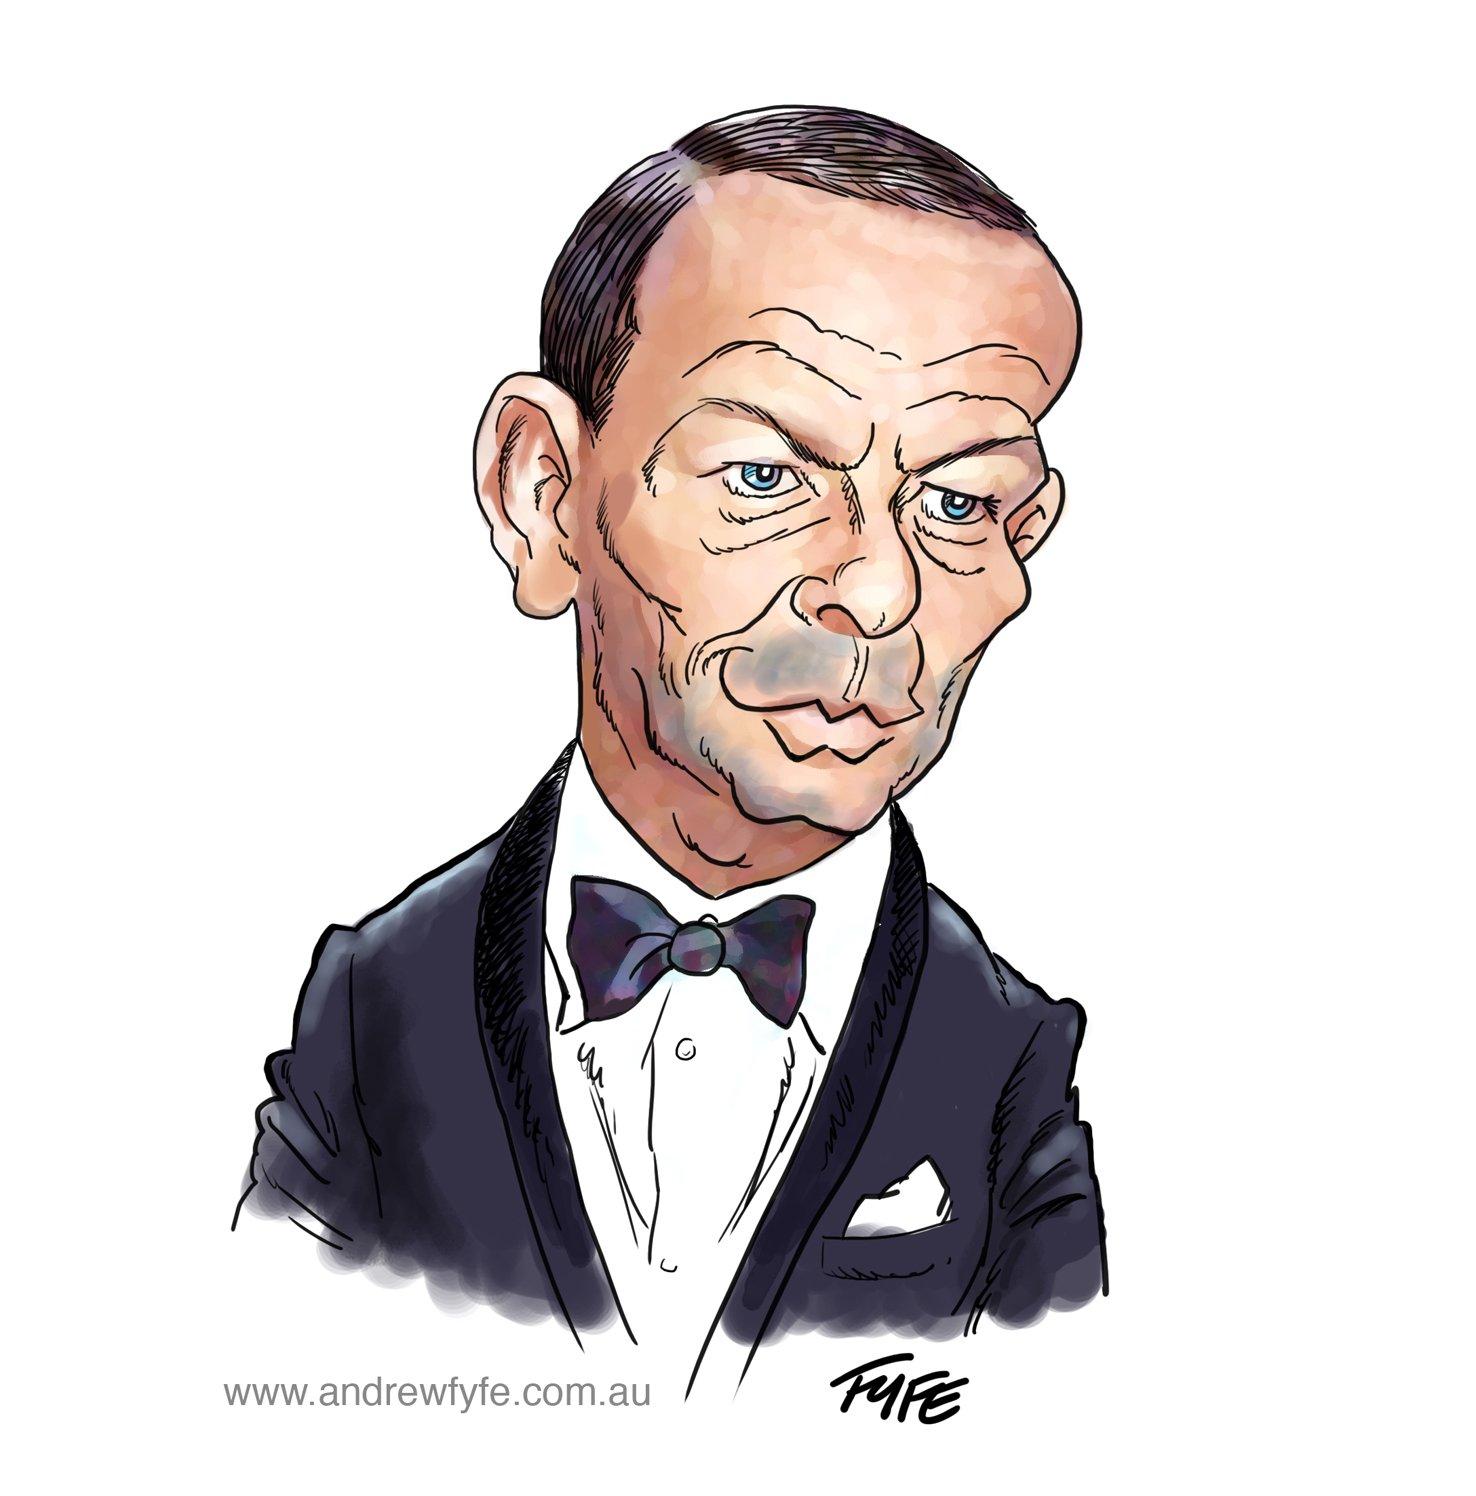 Frank Sinatra, Frank Sinatra caricature, Andrew Fyfe, caricatures